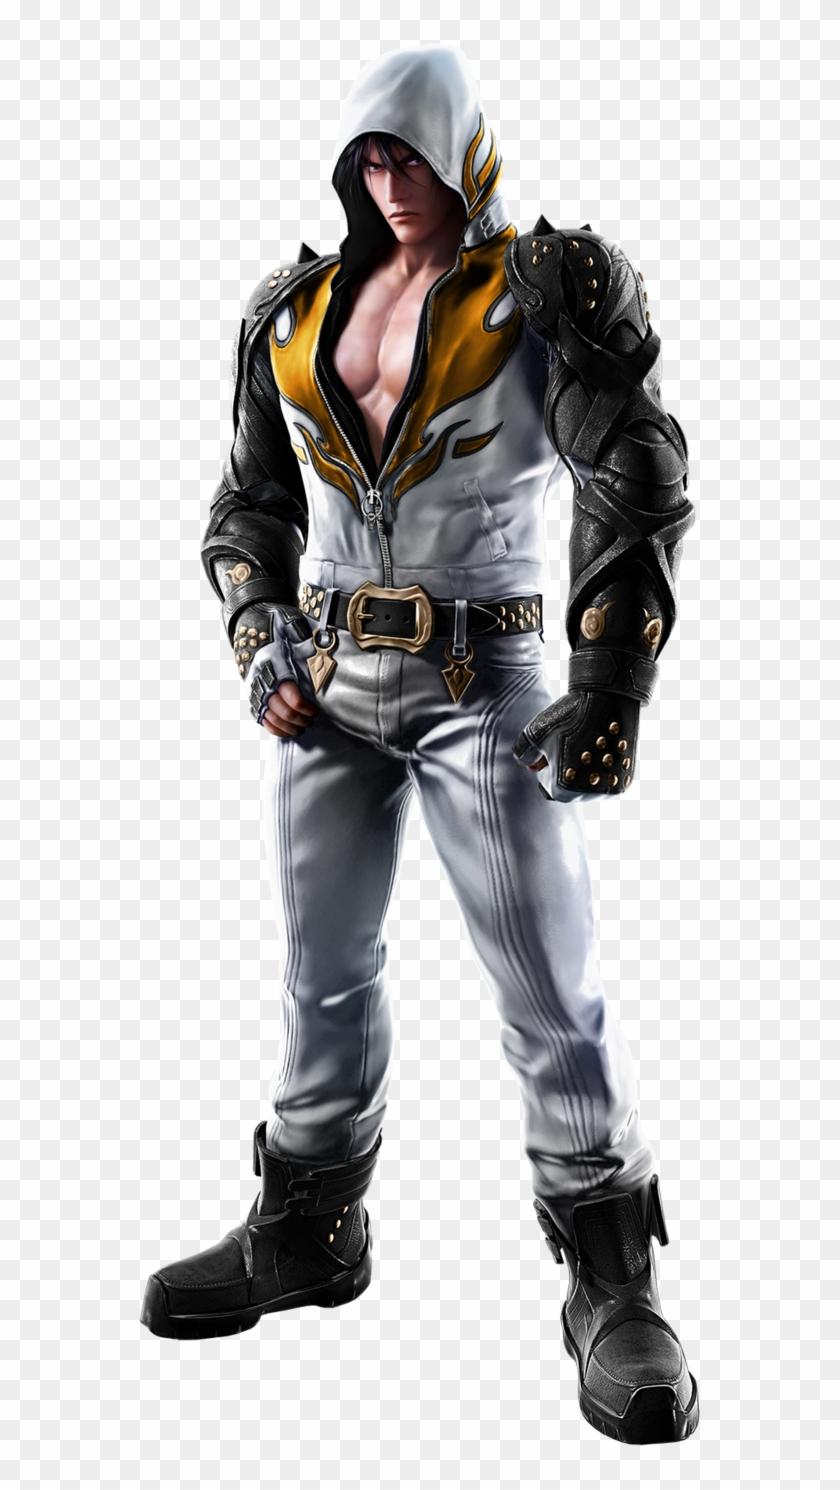 Jin Tekken 7 Png Tekken 7 Jin Kazama Clipart 5692570 Pikpng